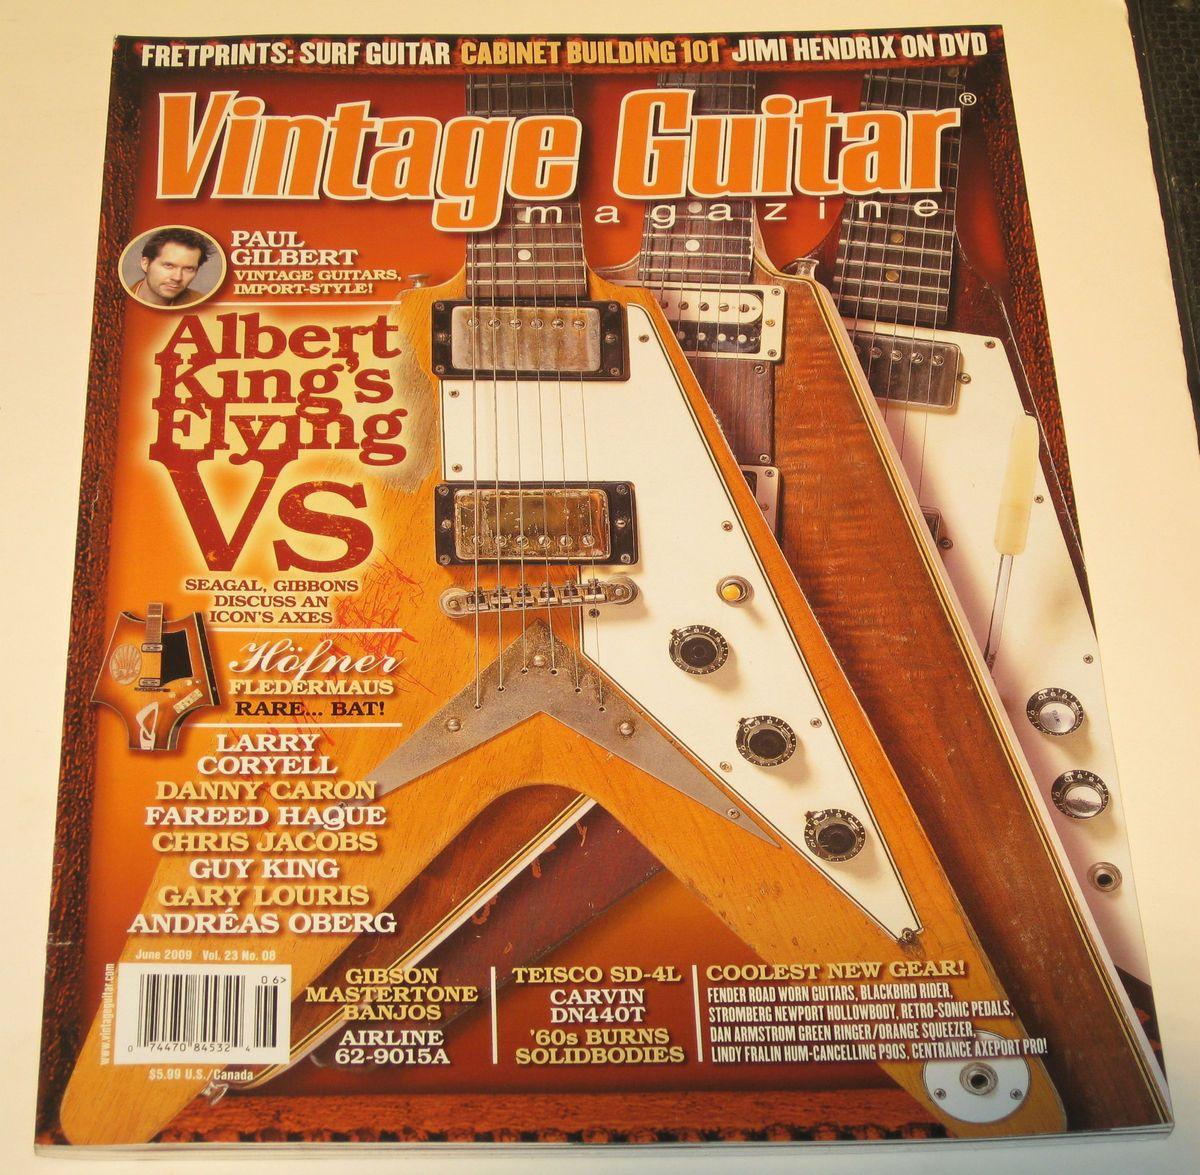 Vintage Guitar Albert King Airline Gibson Mastertone Paul Gilbert